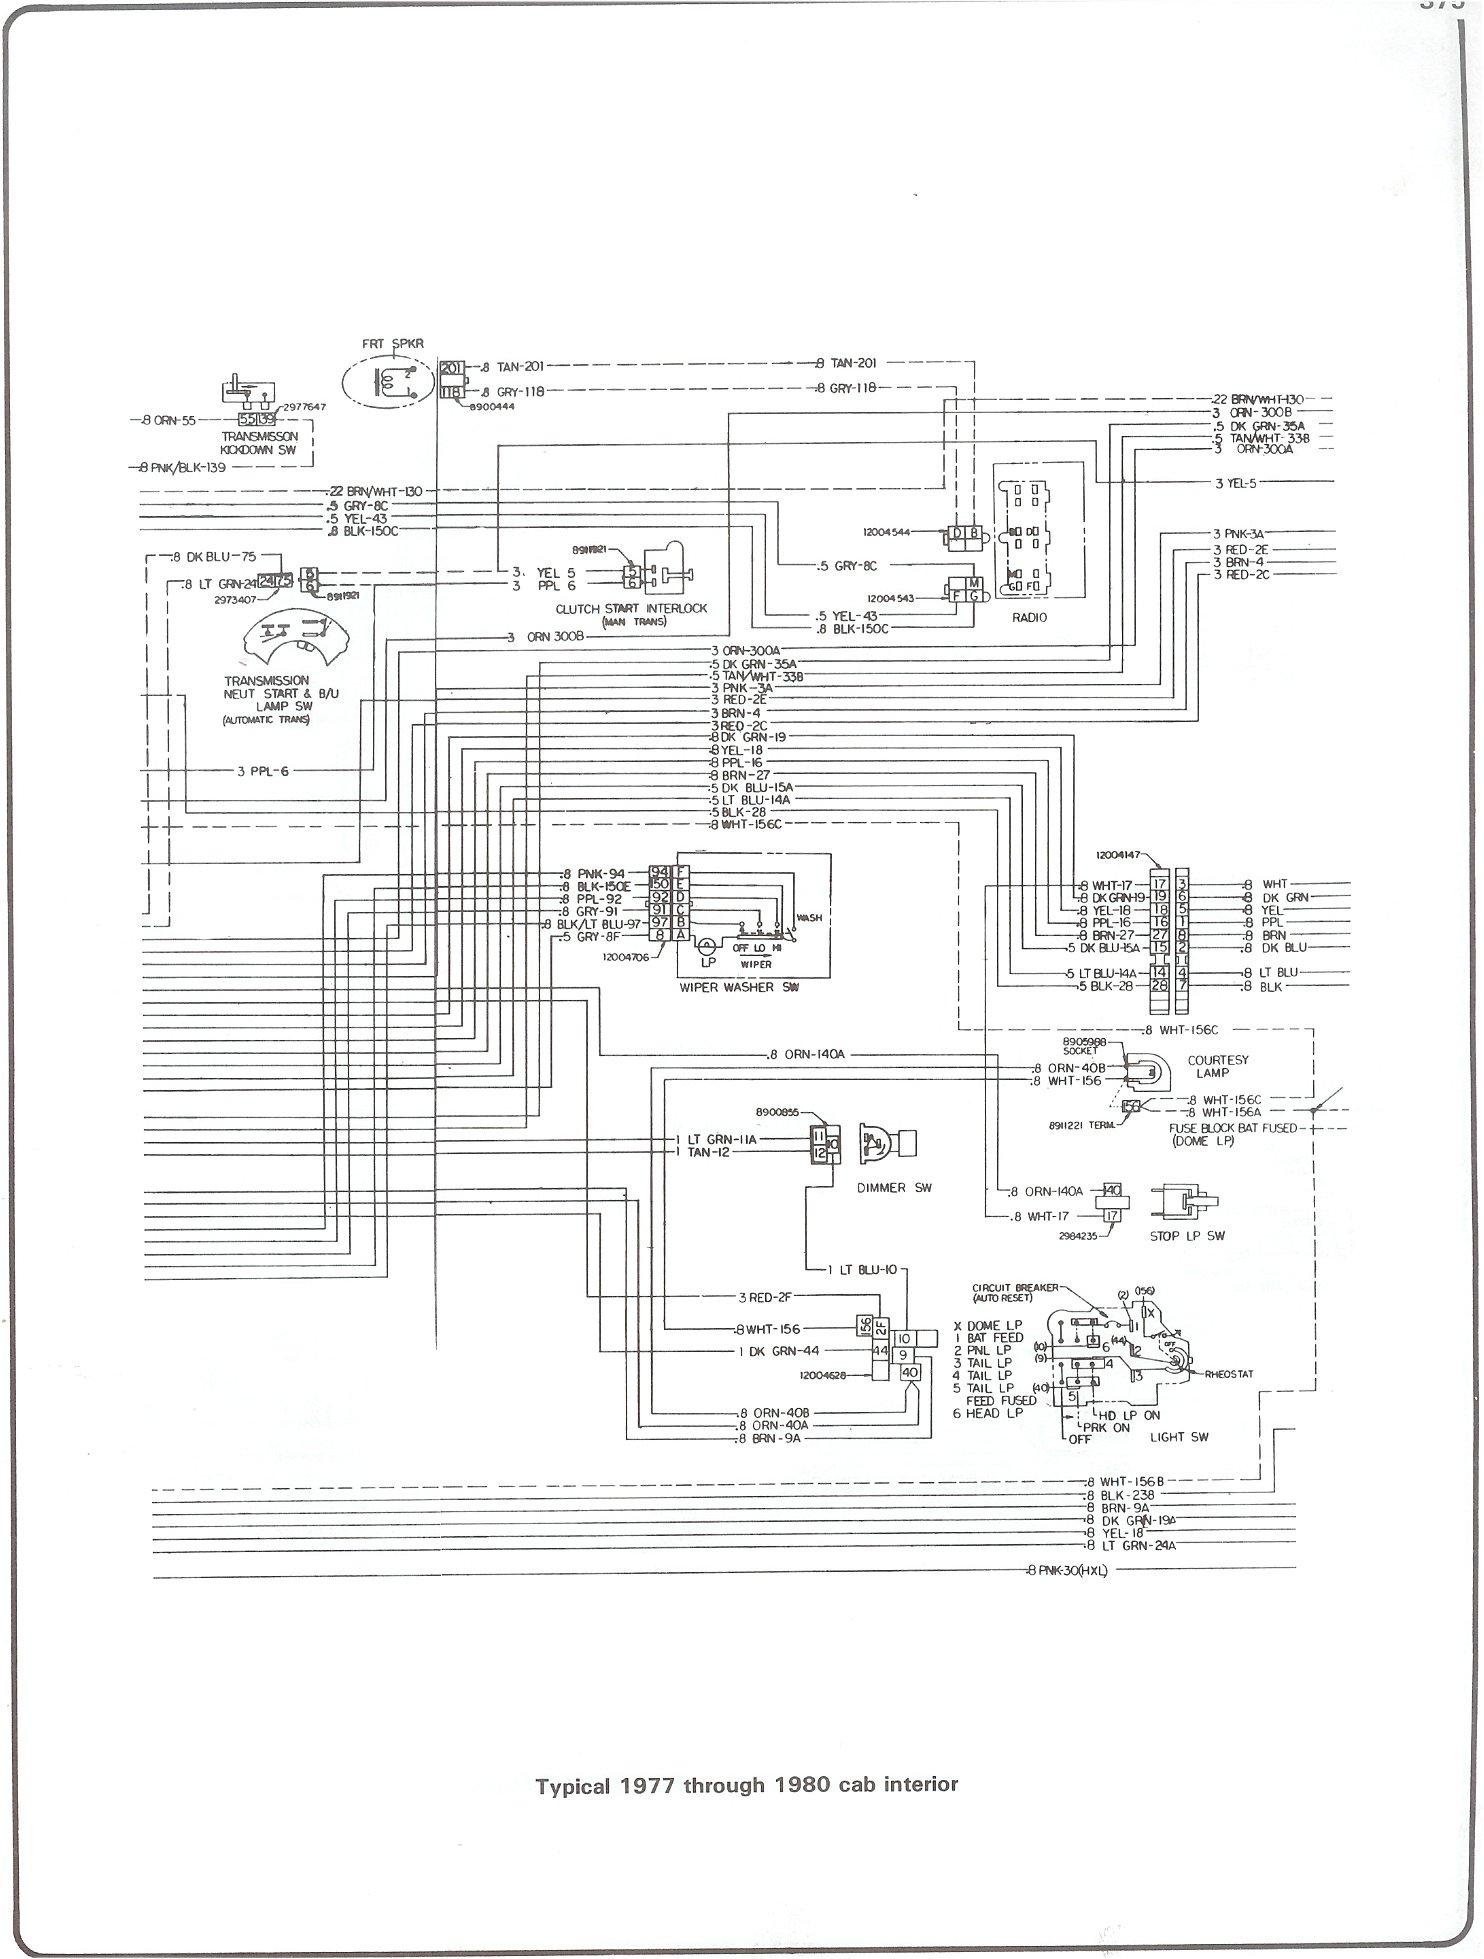 1977 Plymouth Volare Wiring Diagram - 2006 Chevy Colorado Computer Wiring  Diagram - fuses-boxs.kankubuktikan.jeanjaures37.frWiring Diagram Resource